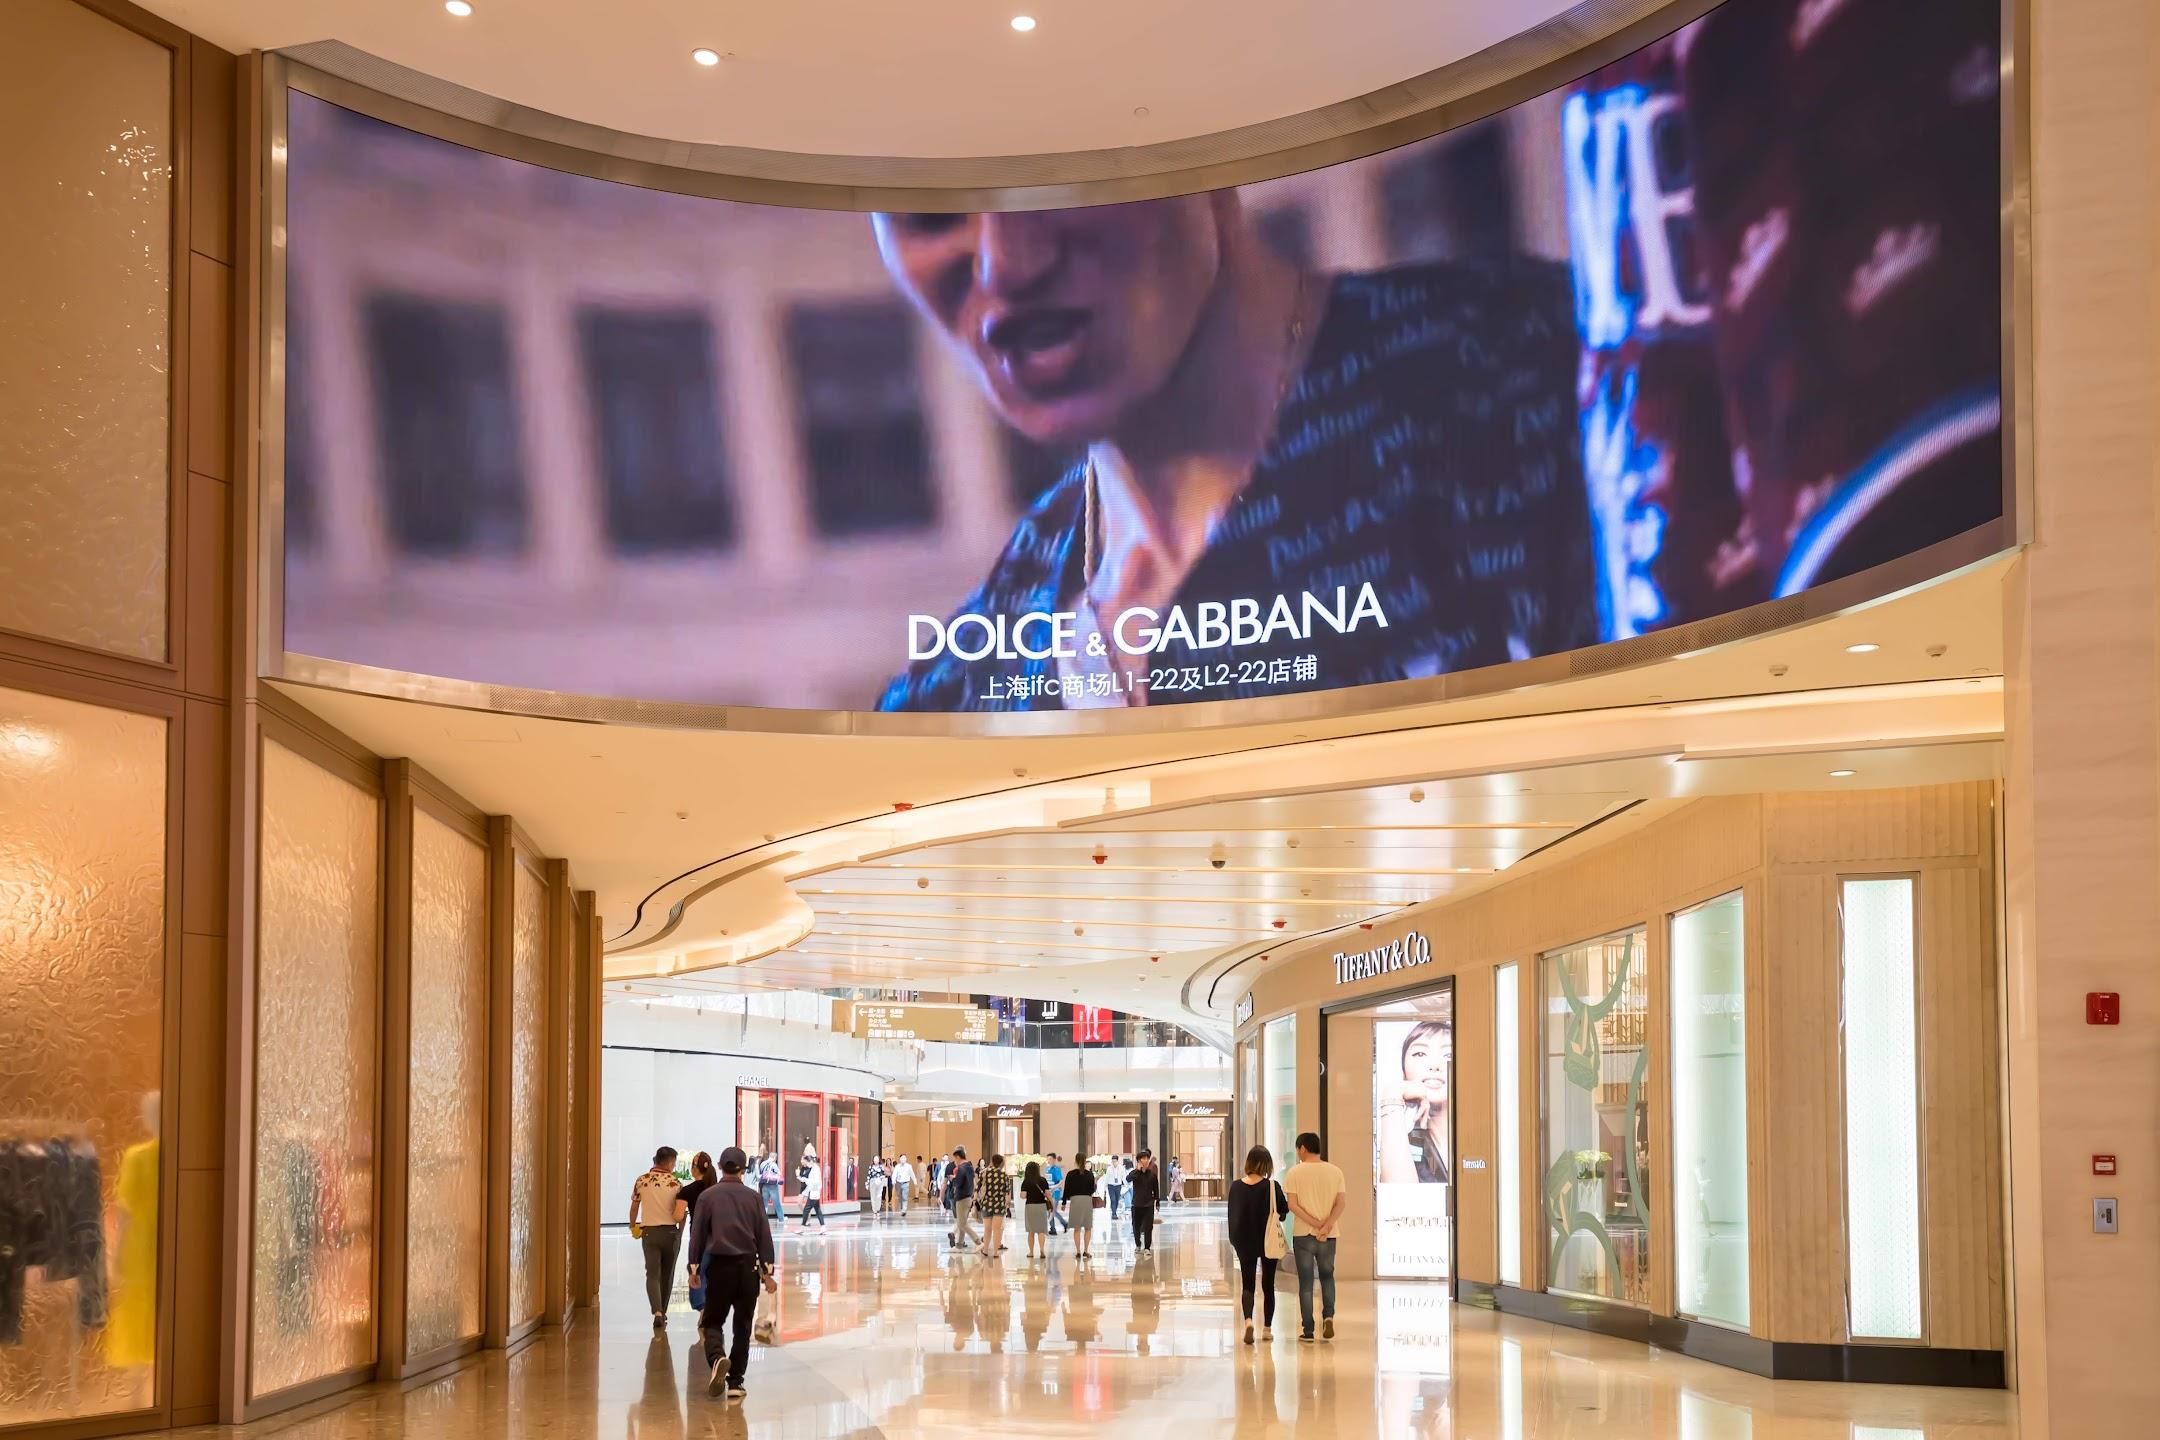 Shanghai ifc Mall4